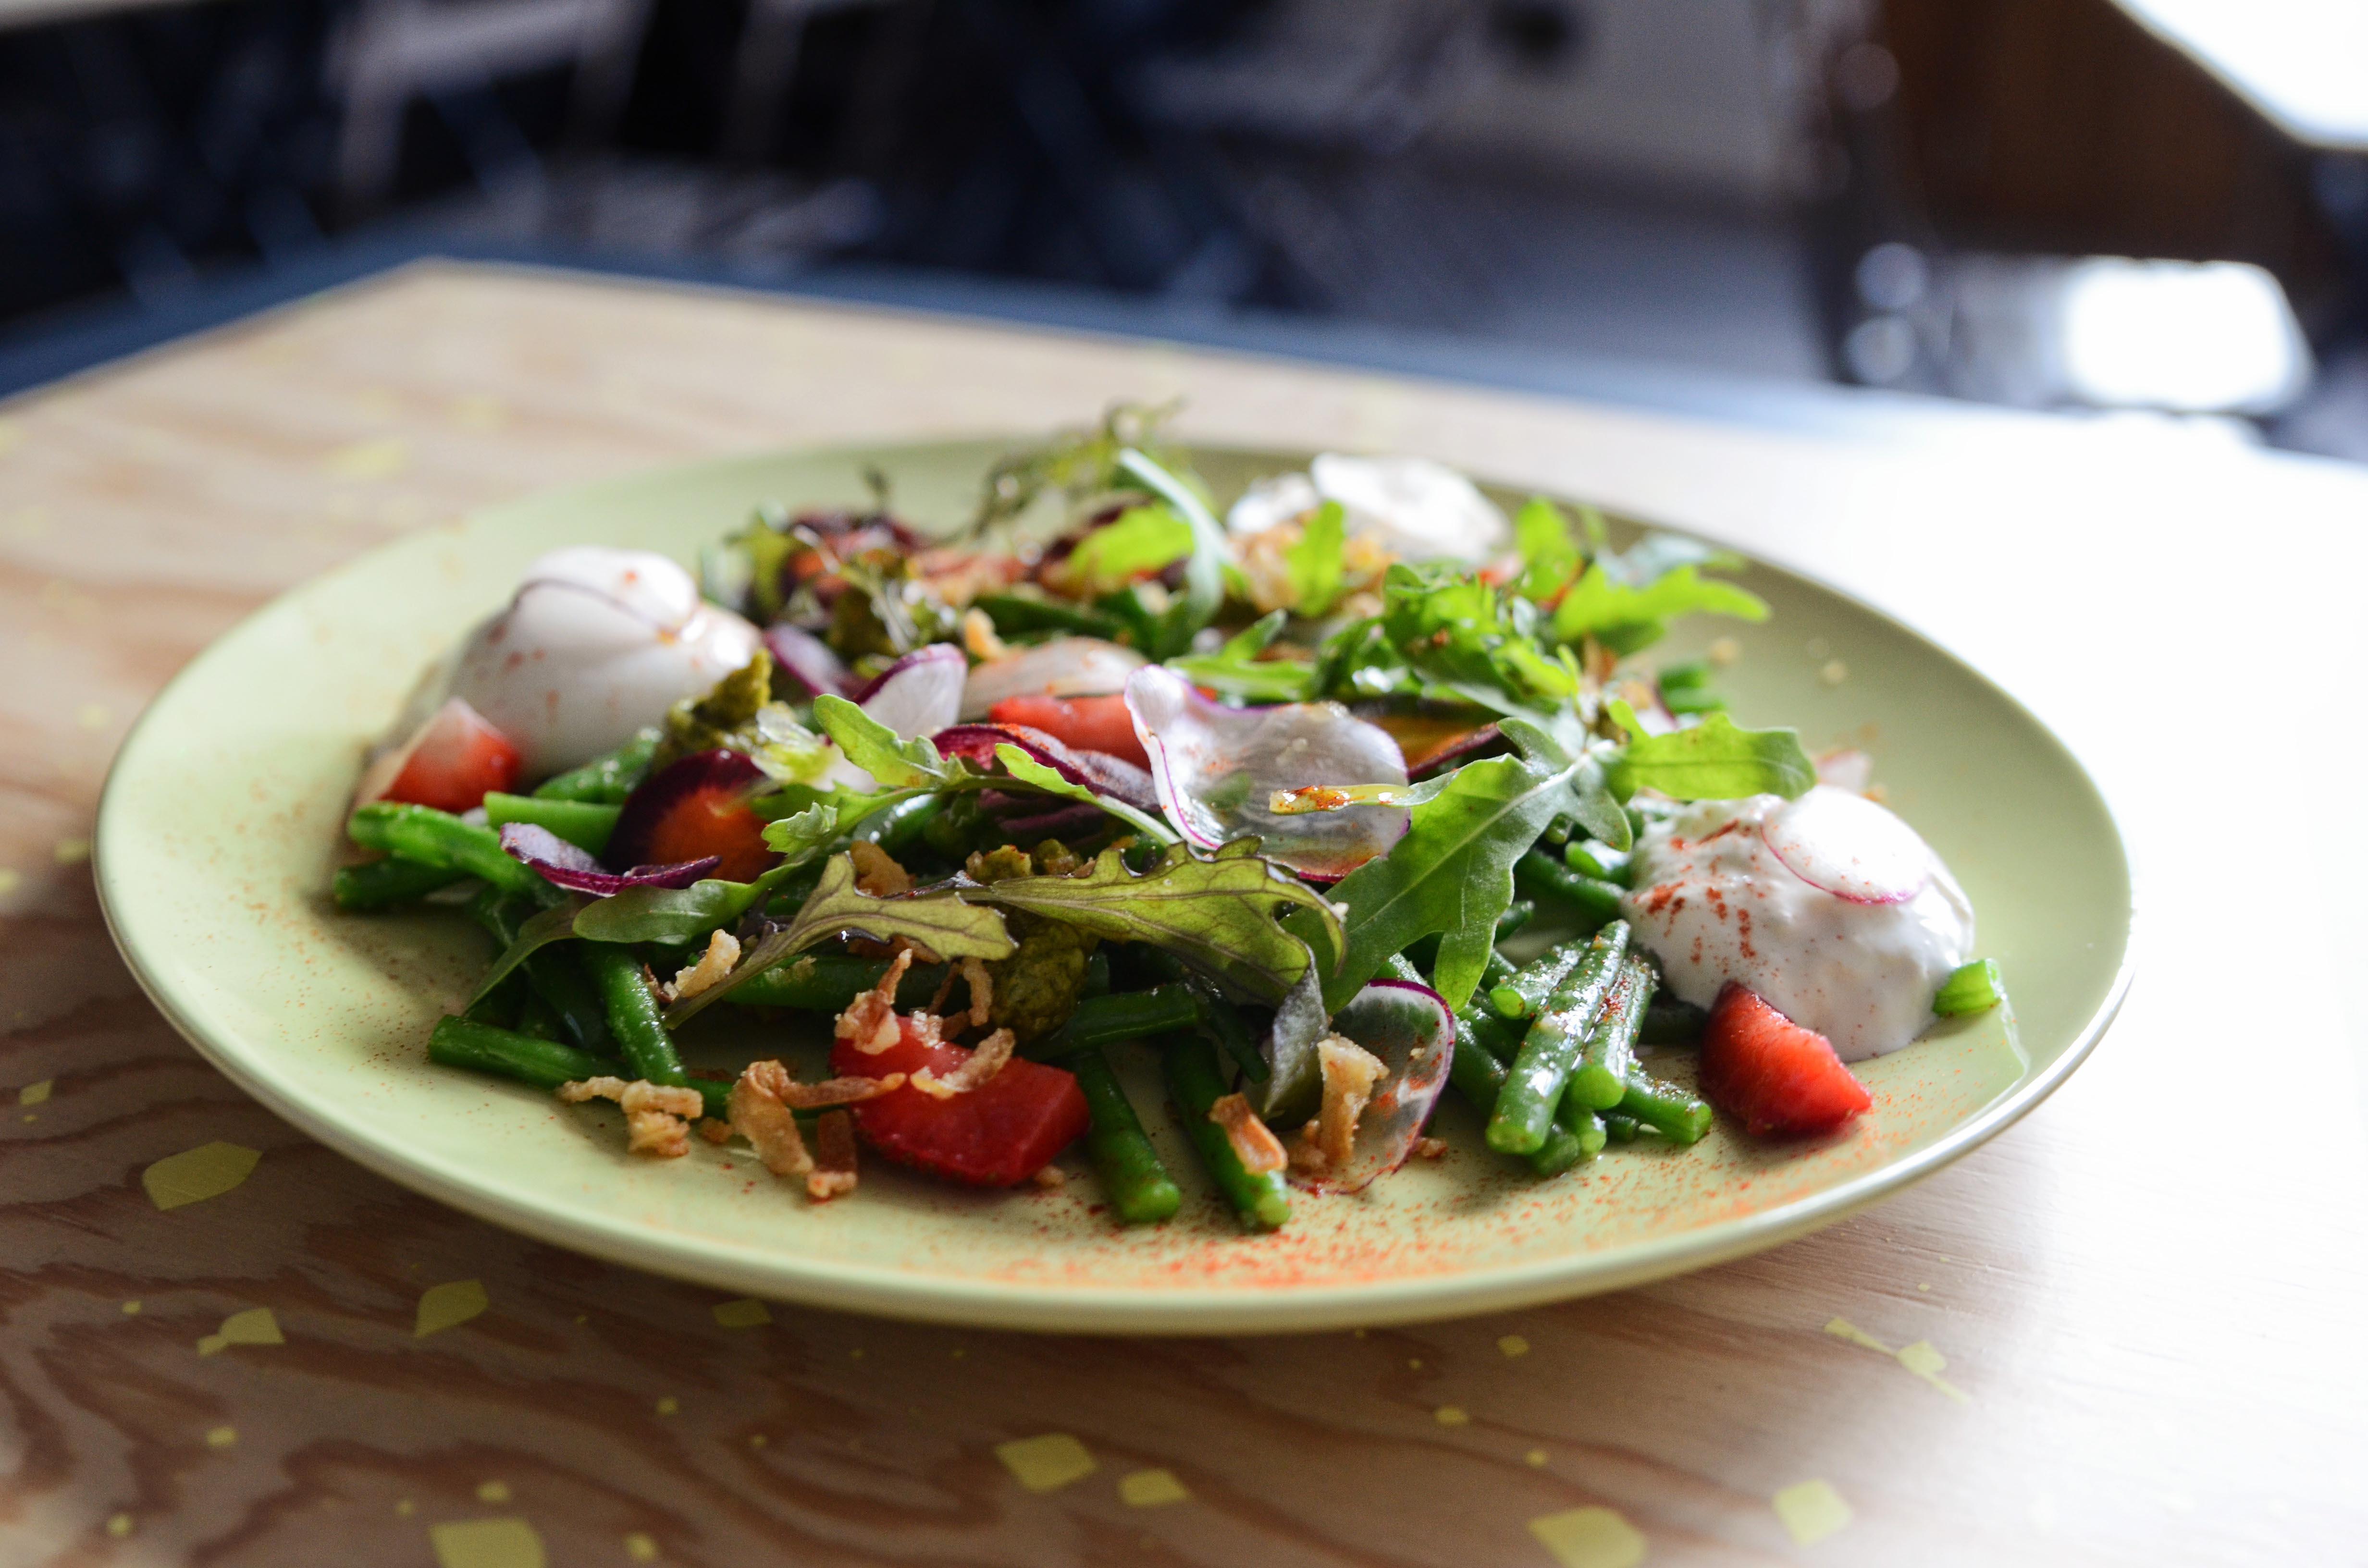 Salade haricots verts  fraises   oignons frits  pesto pistache